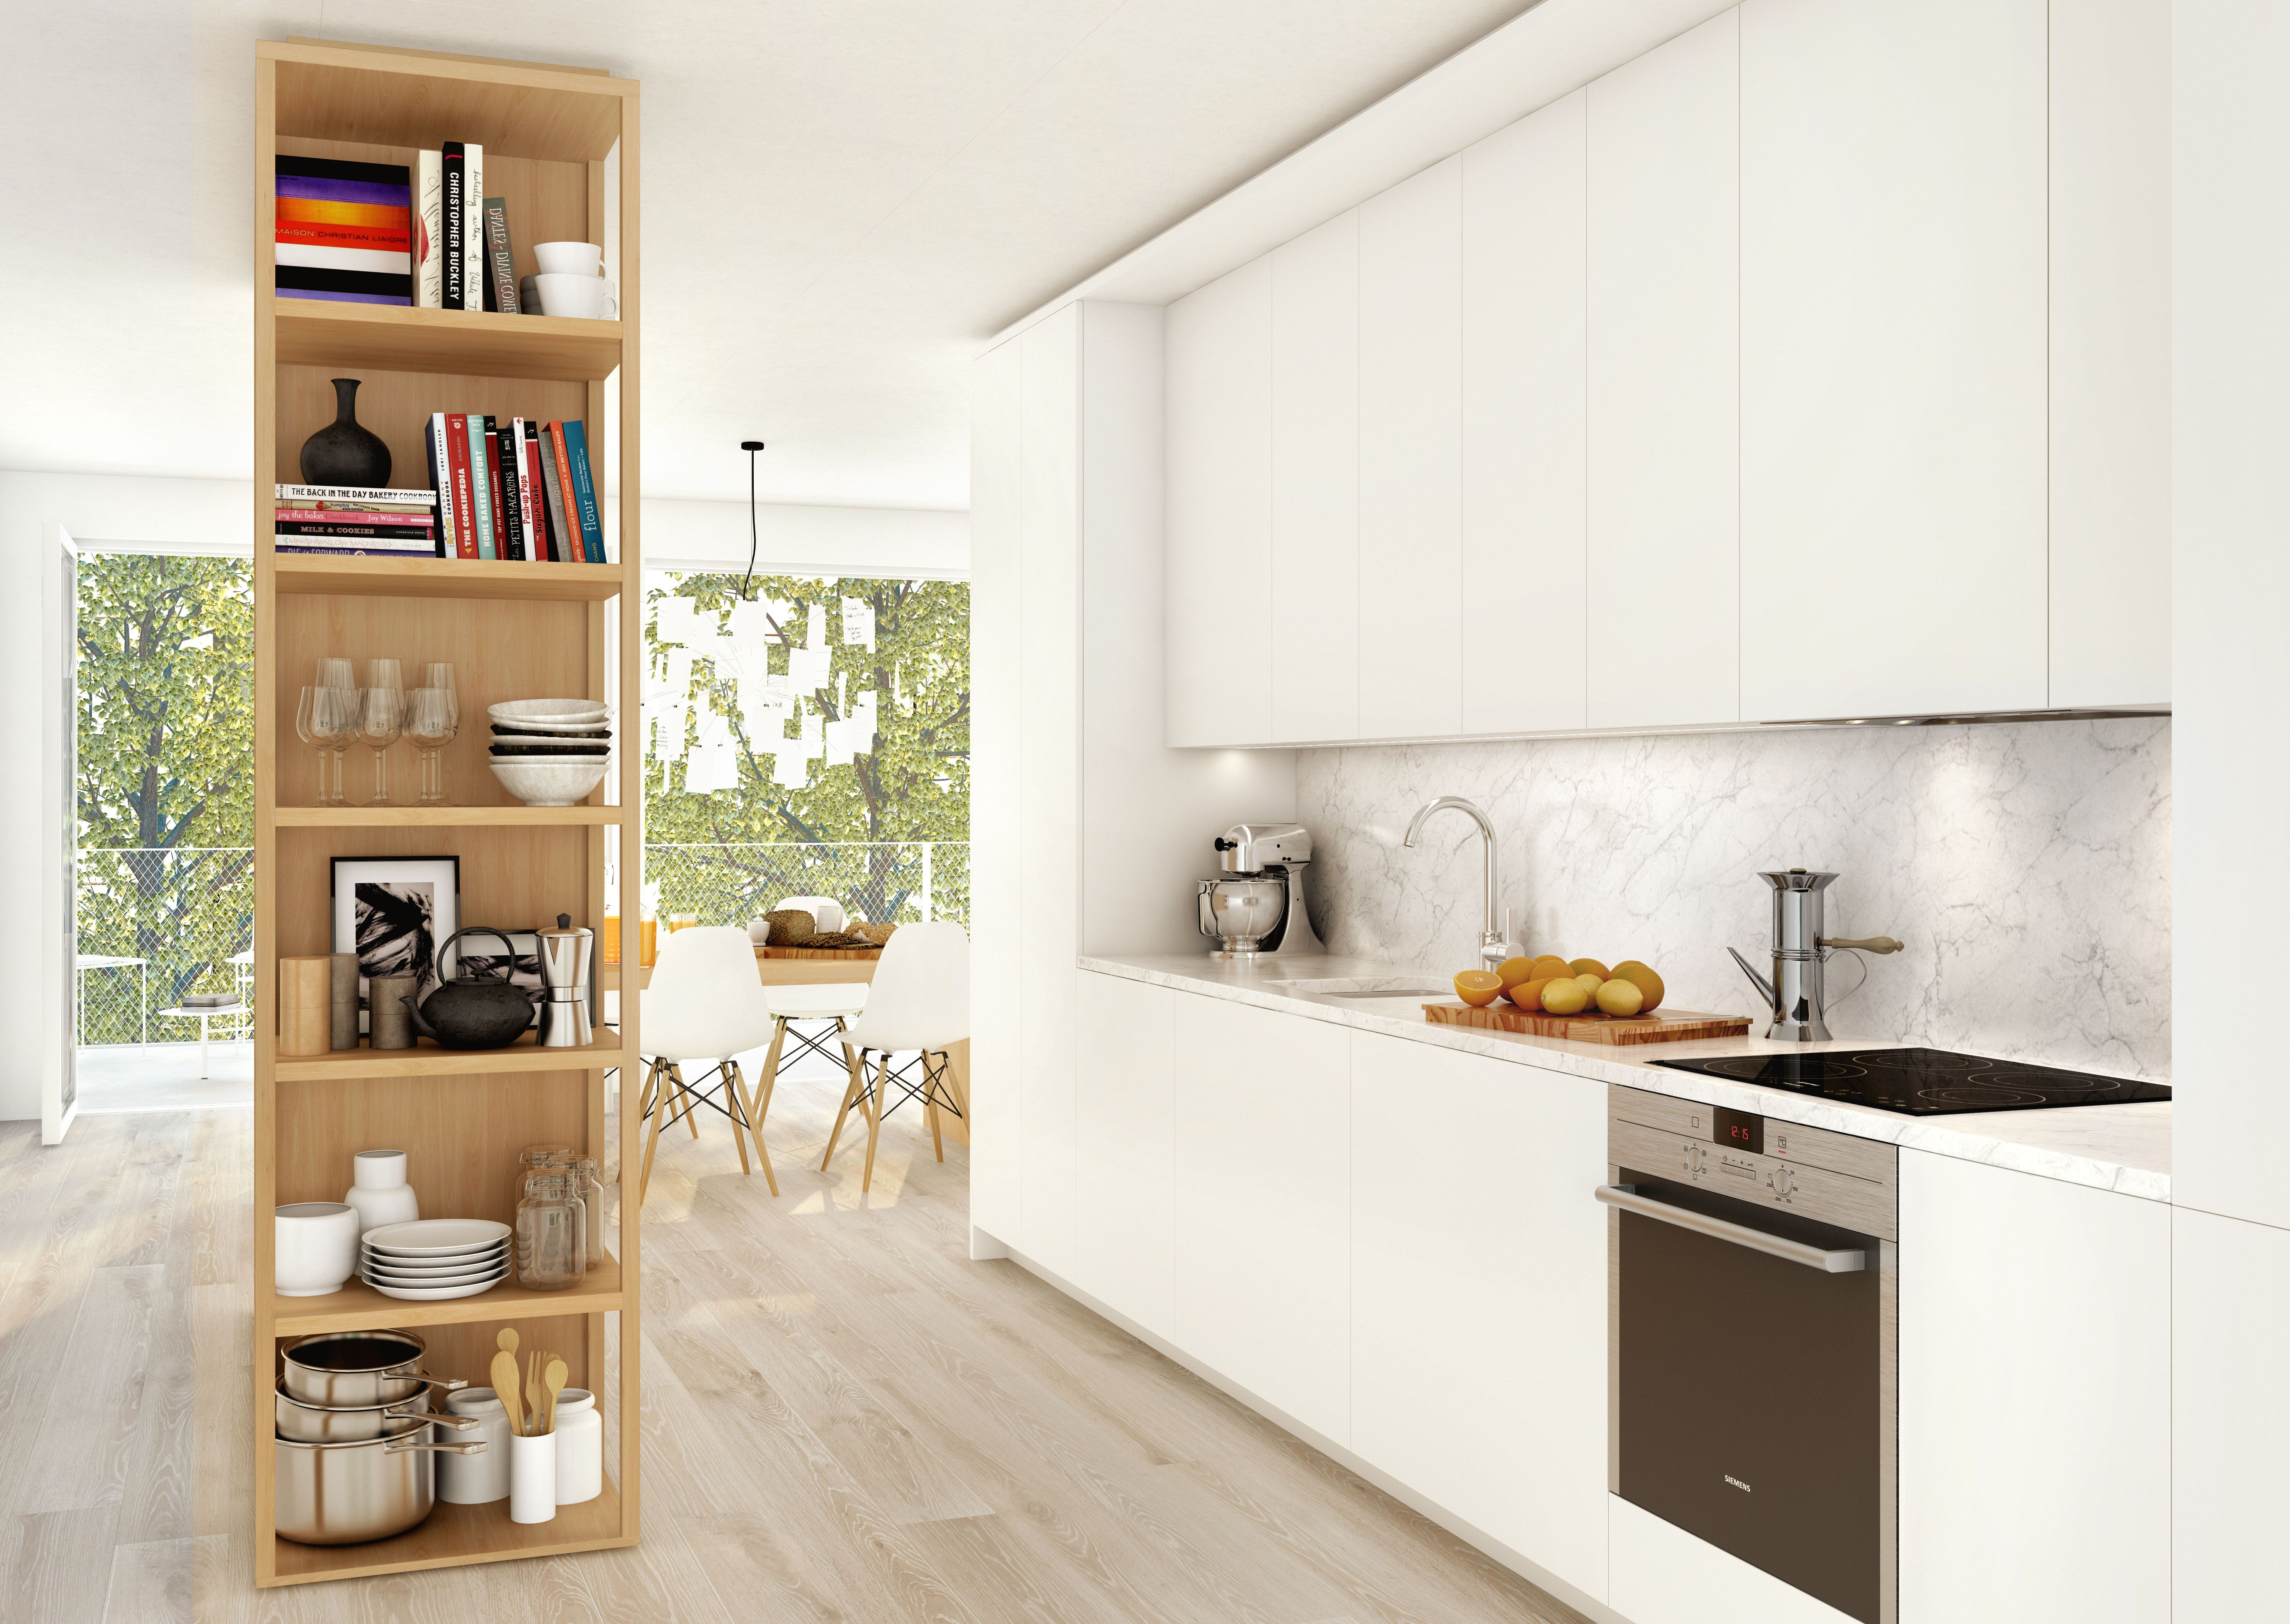 Kitchen Interiors Hg7 Oscarproperties Kitchen Interiors Design Inspiration